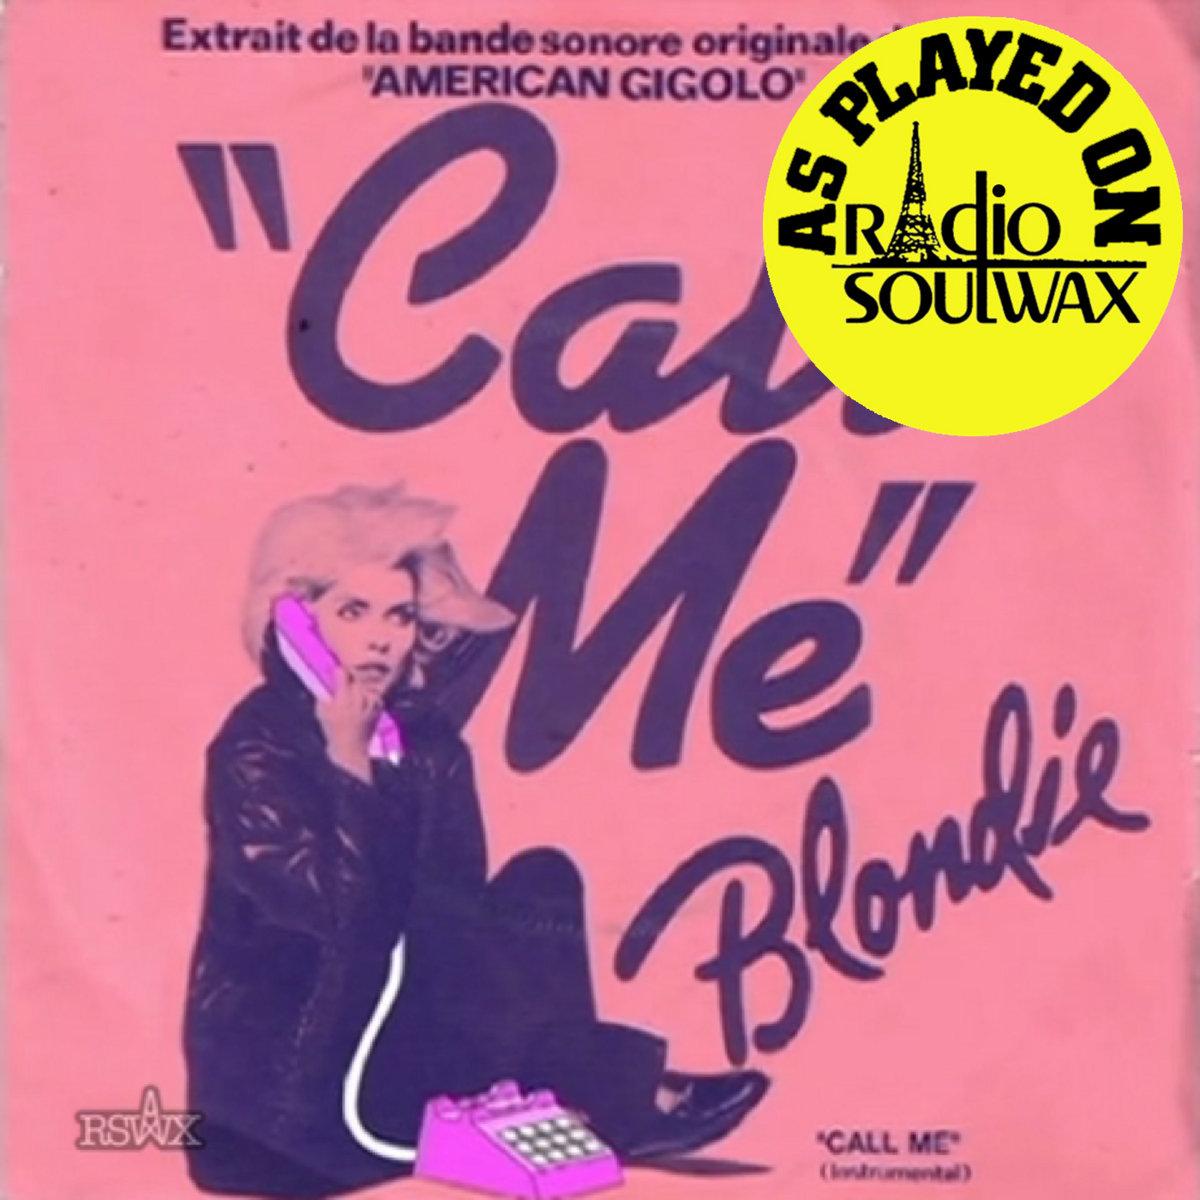 blondie call me mht99 soulwax edit mark harriert99